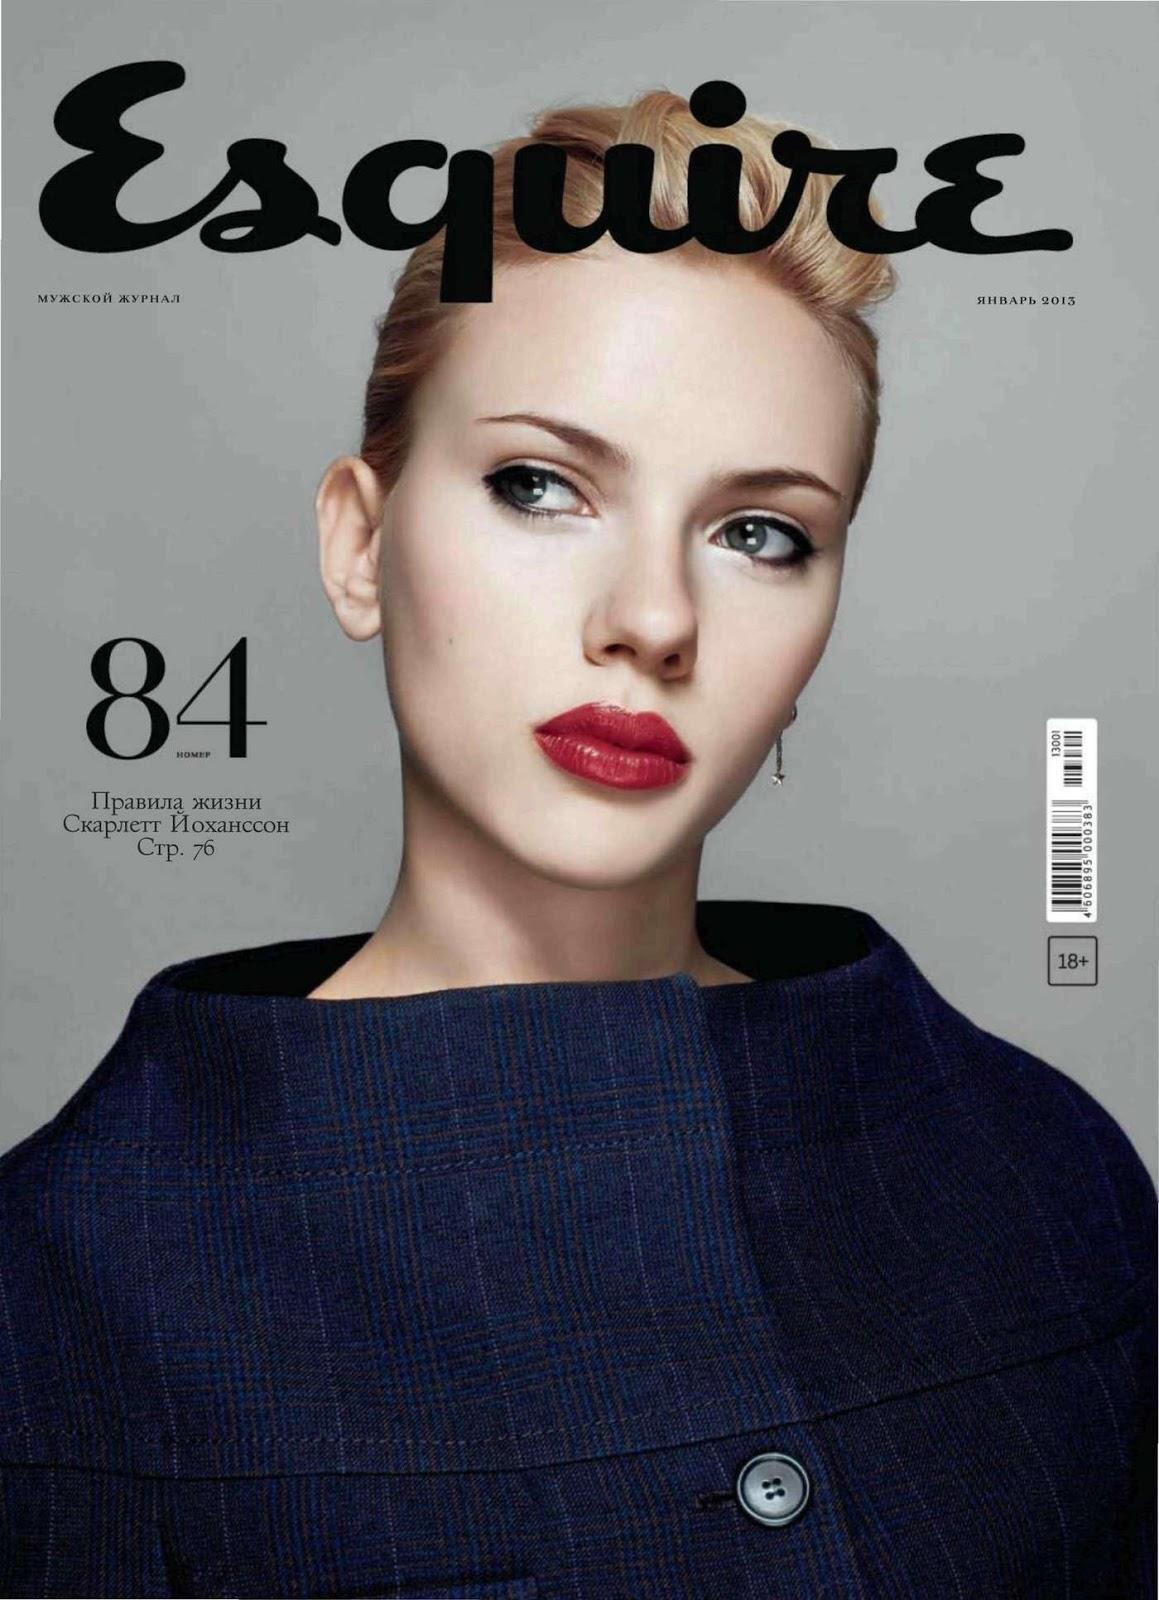 http://2.bp.blogspot.com/-otFT_SS8SLU/UOkvLyVTFdI/AAAAAAAADvo/pVxVppBTQqc/s1600/Scarlett+Johansson+%E2%80%93+Esquire+Russia+Magazine+(January+2013)+by+justfunz.com+1.jpg